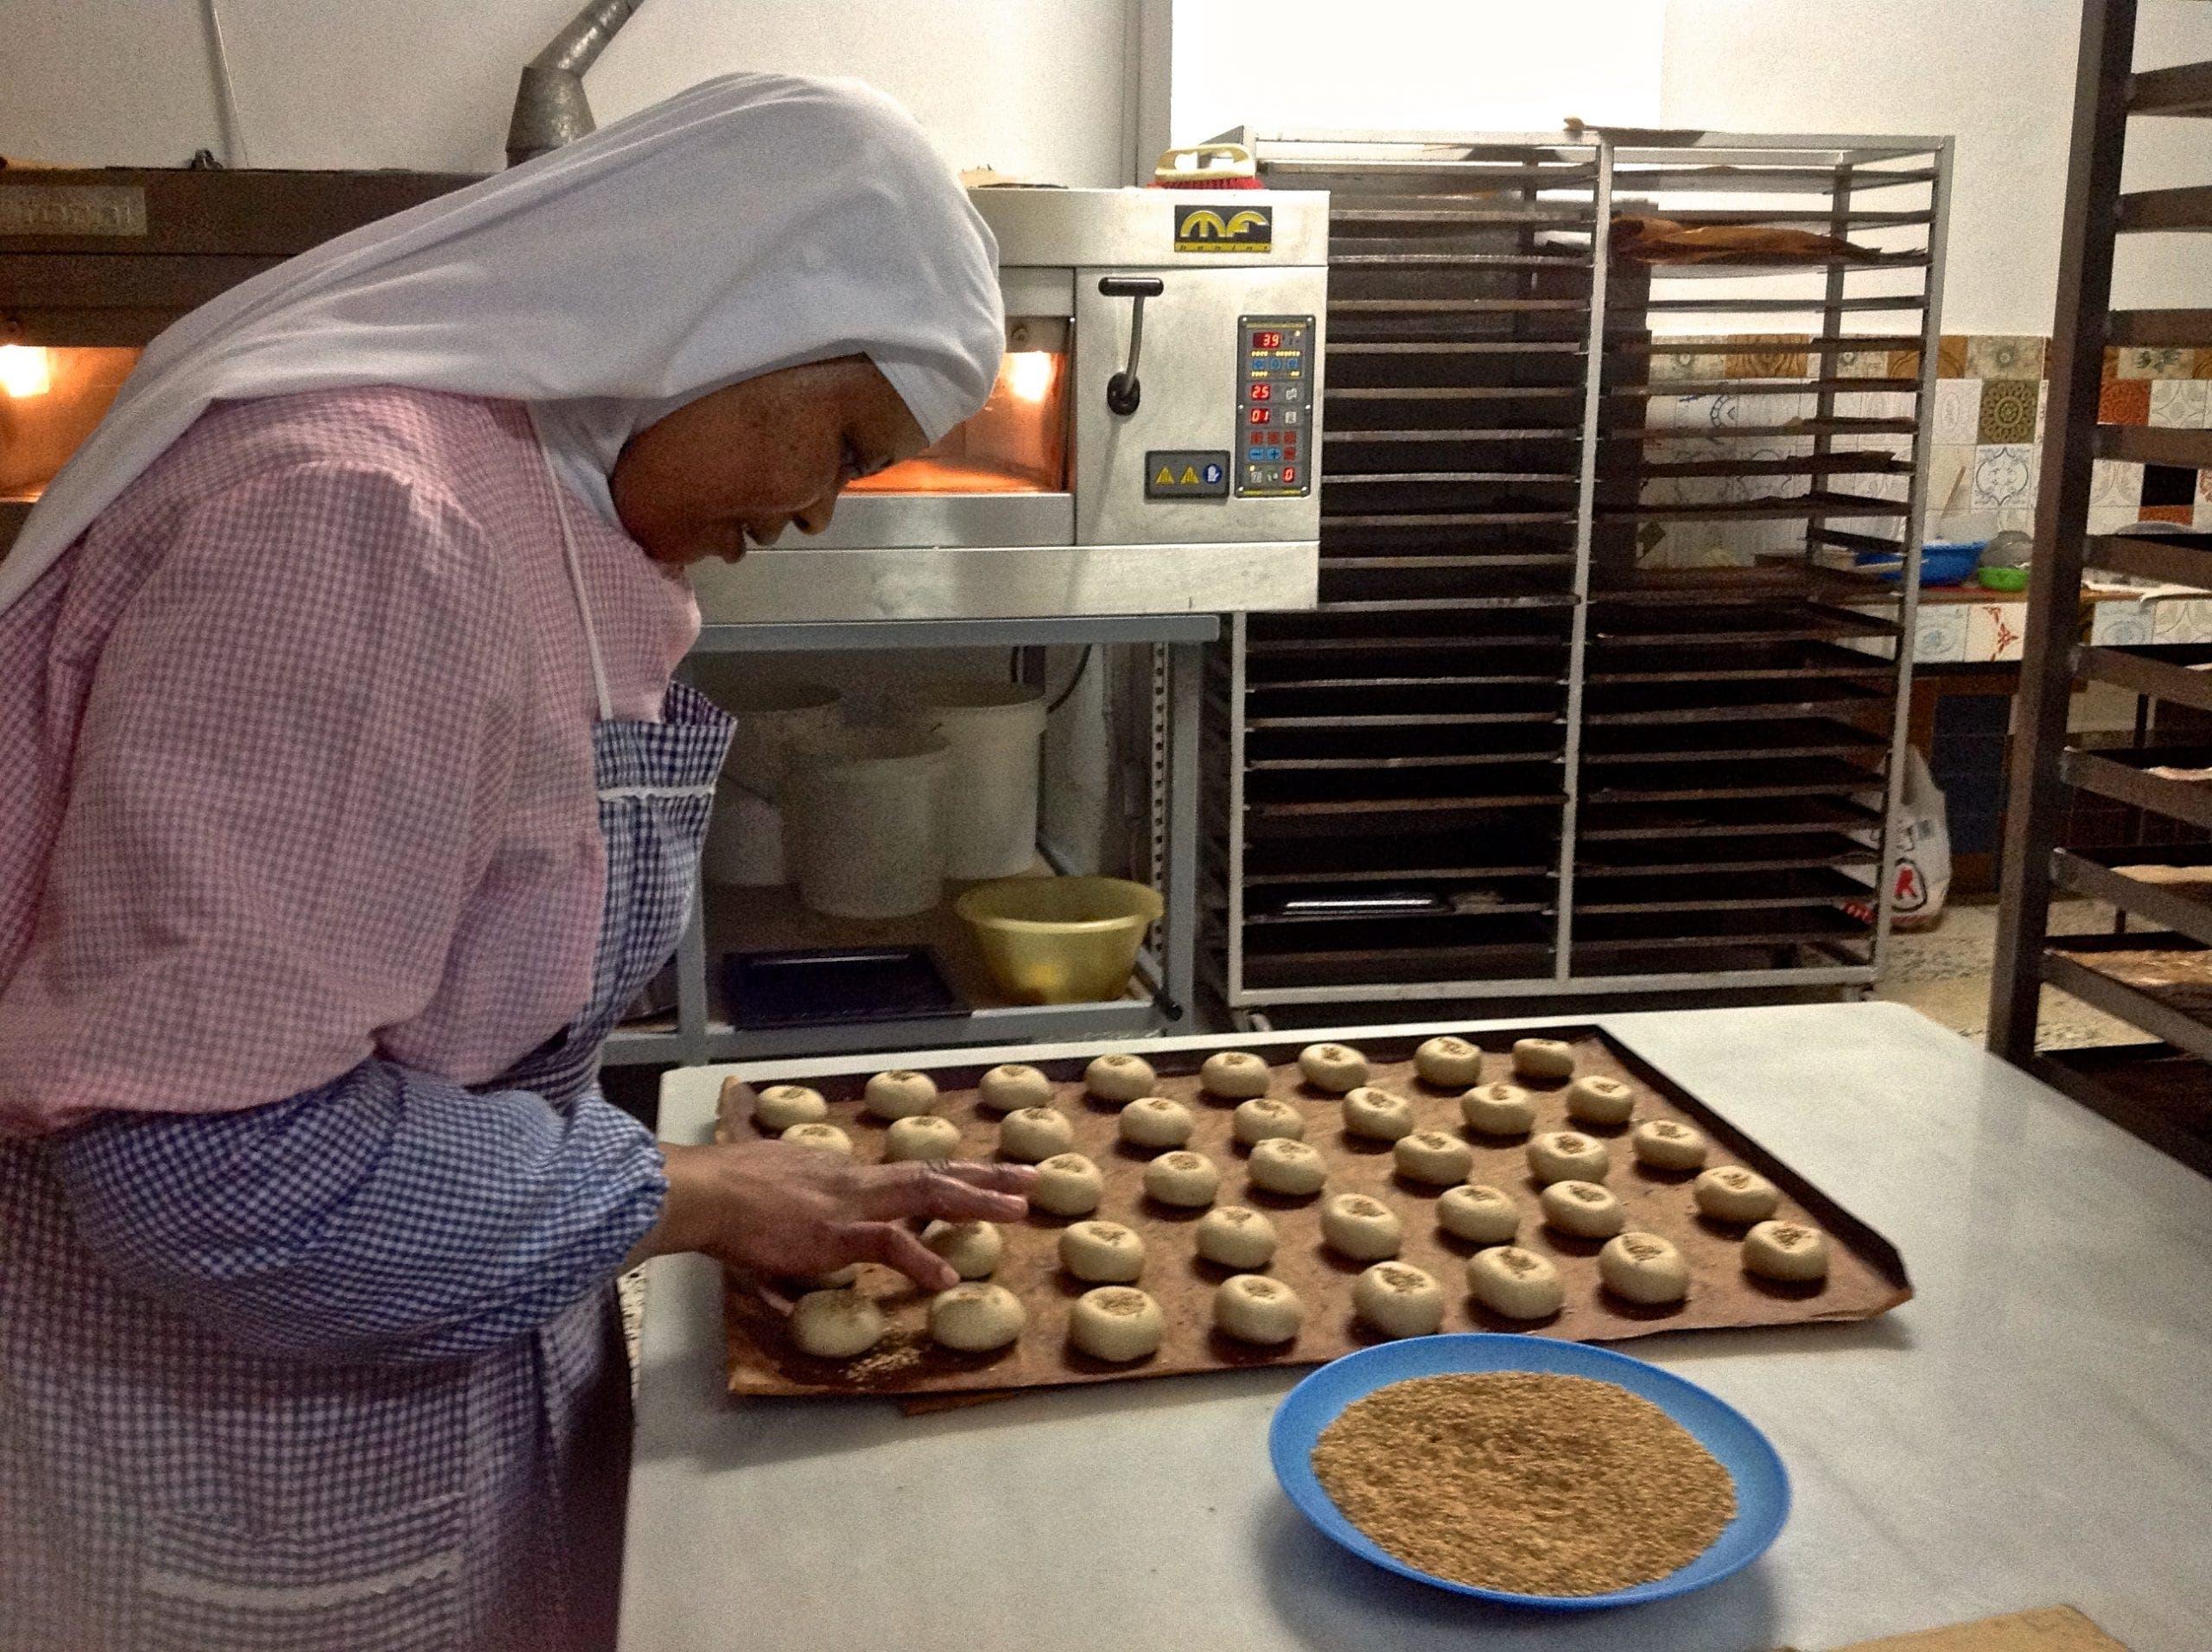 Adding The Sesame Seeds Photo Karethe Linaae